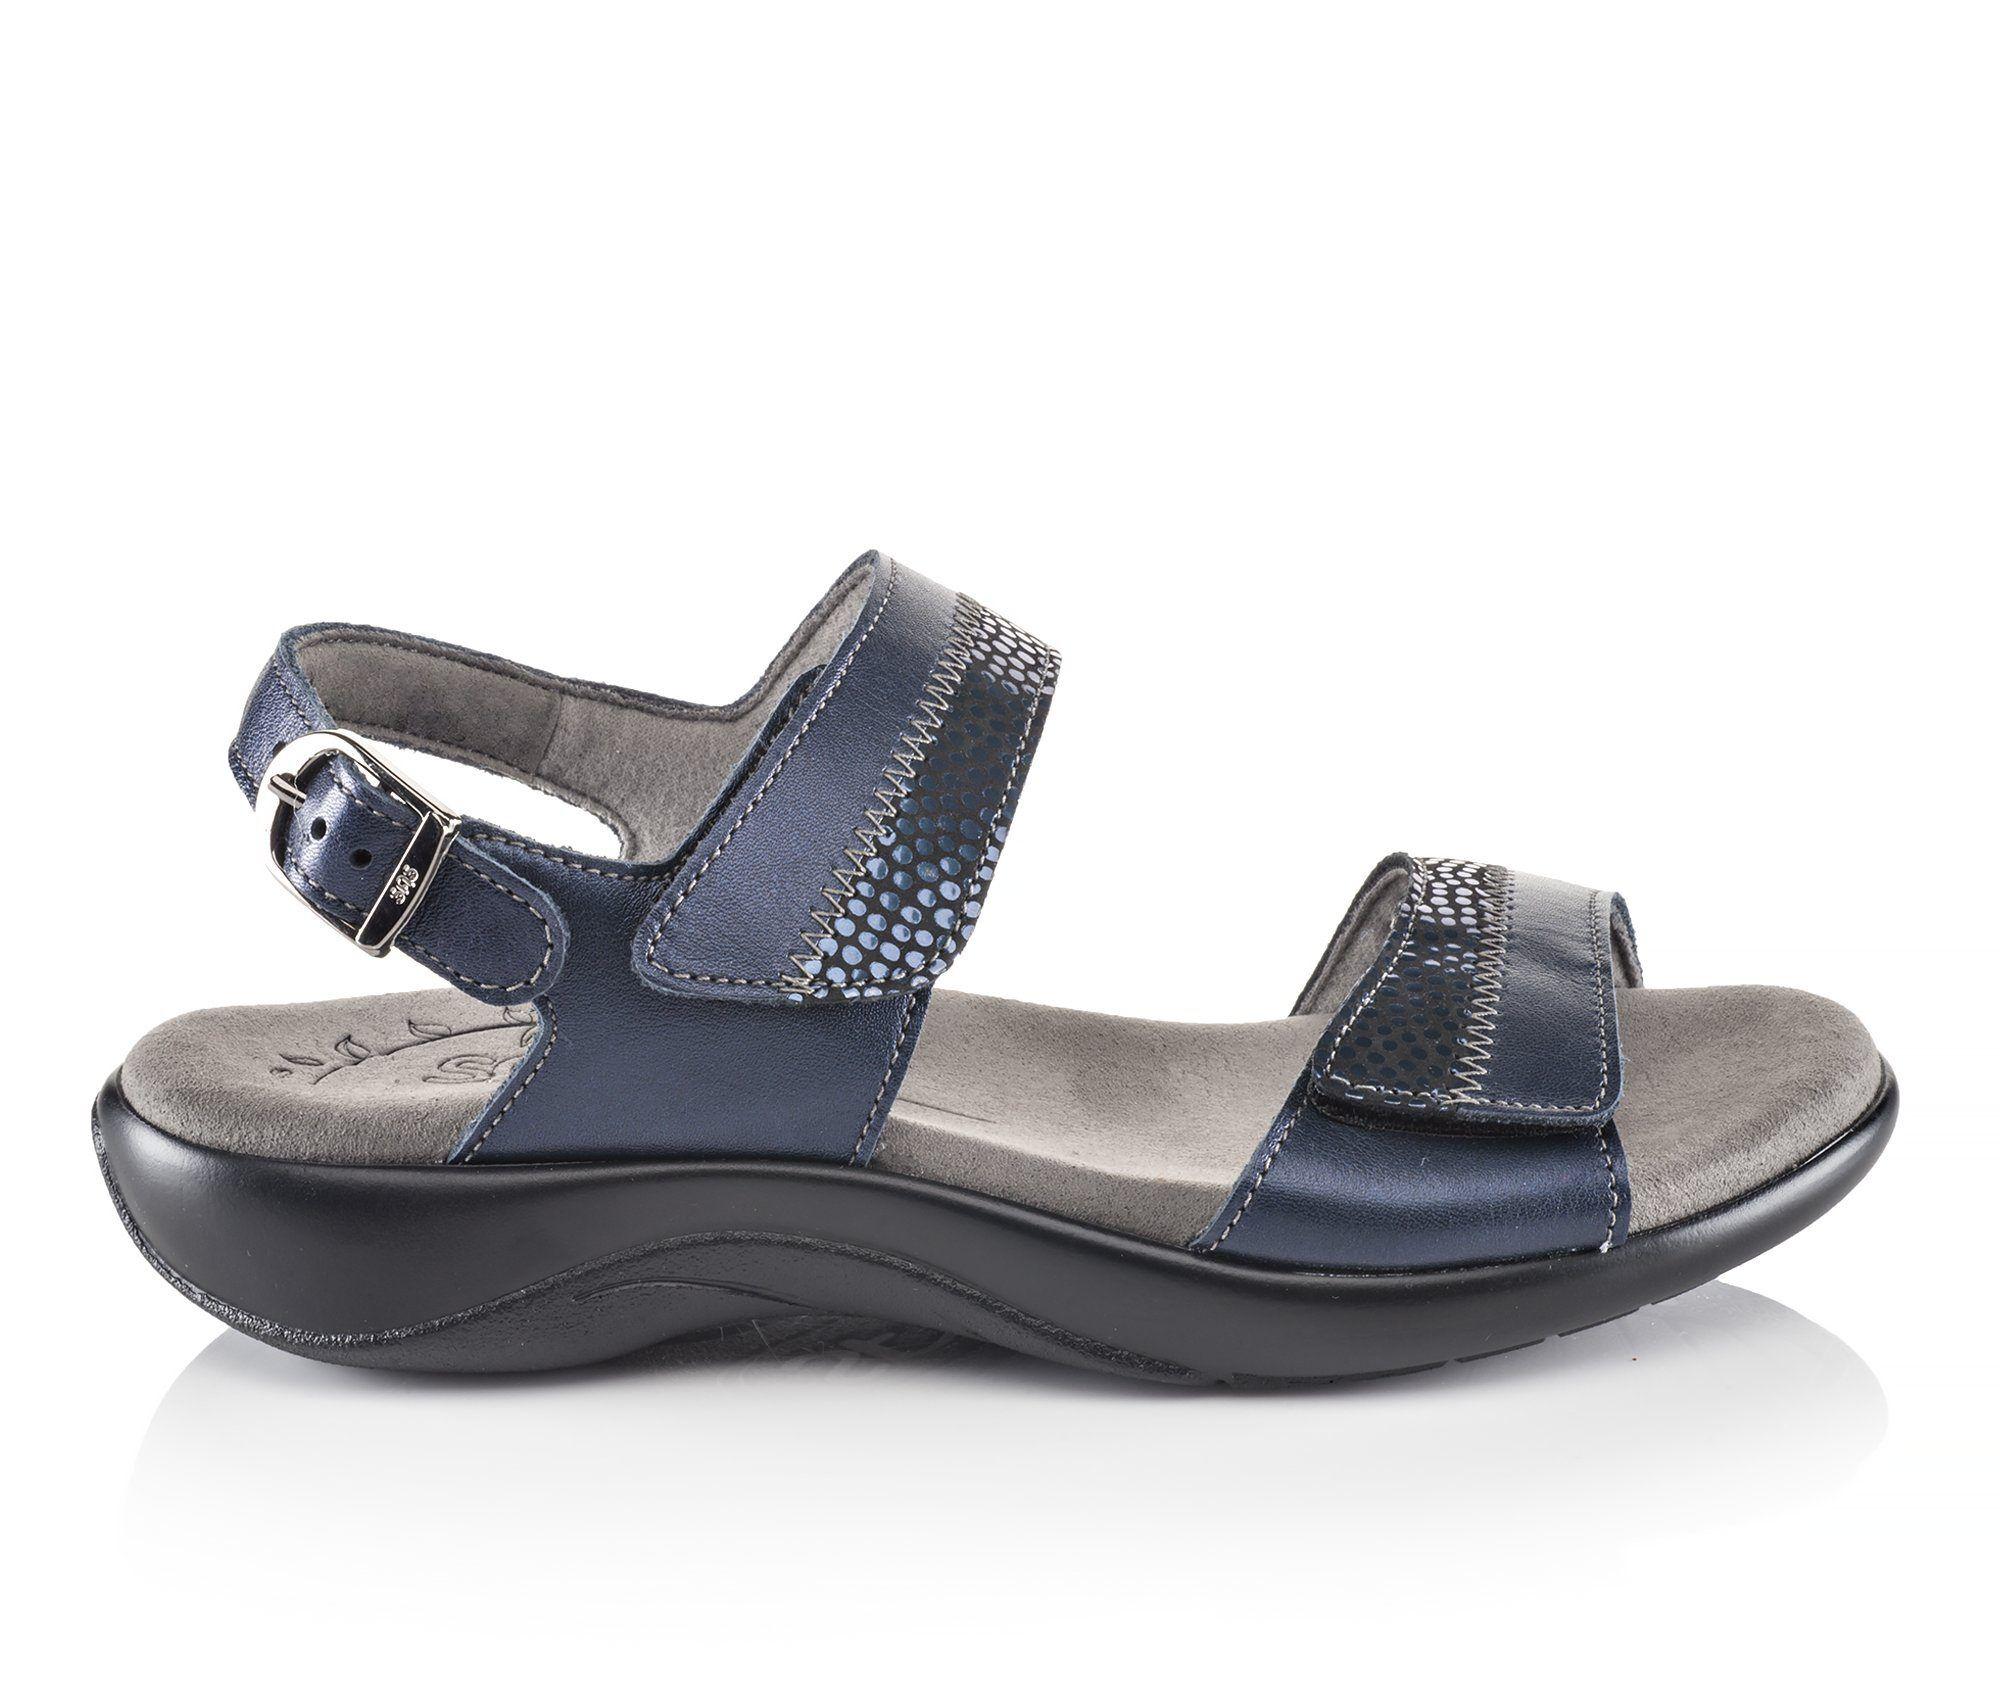 Designer For Sale Women's Sas Nudu Sandals Navy